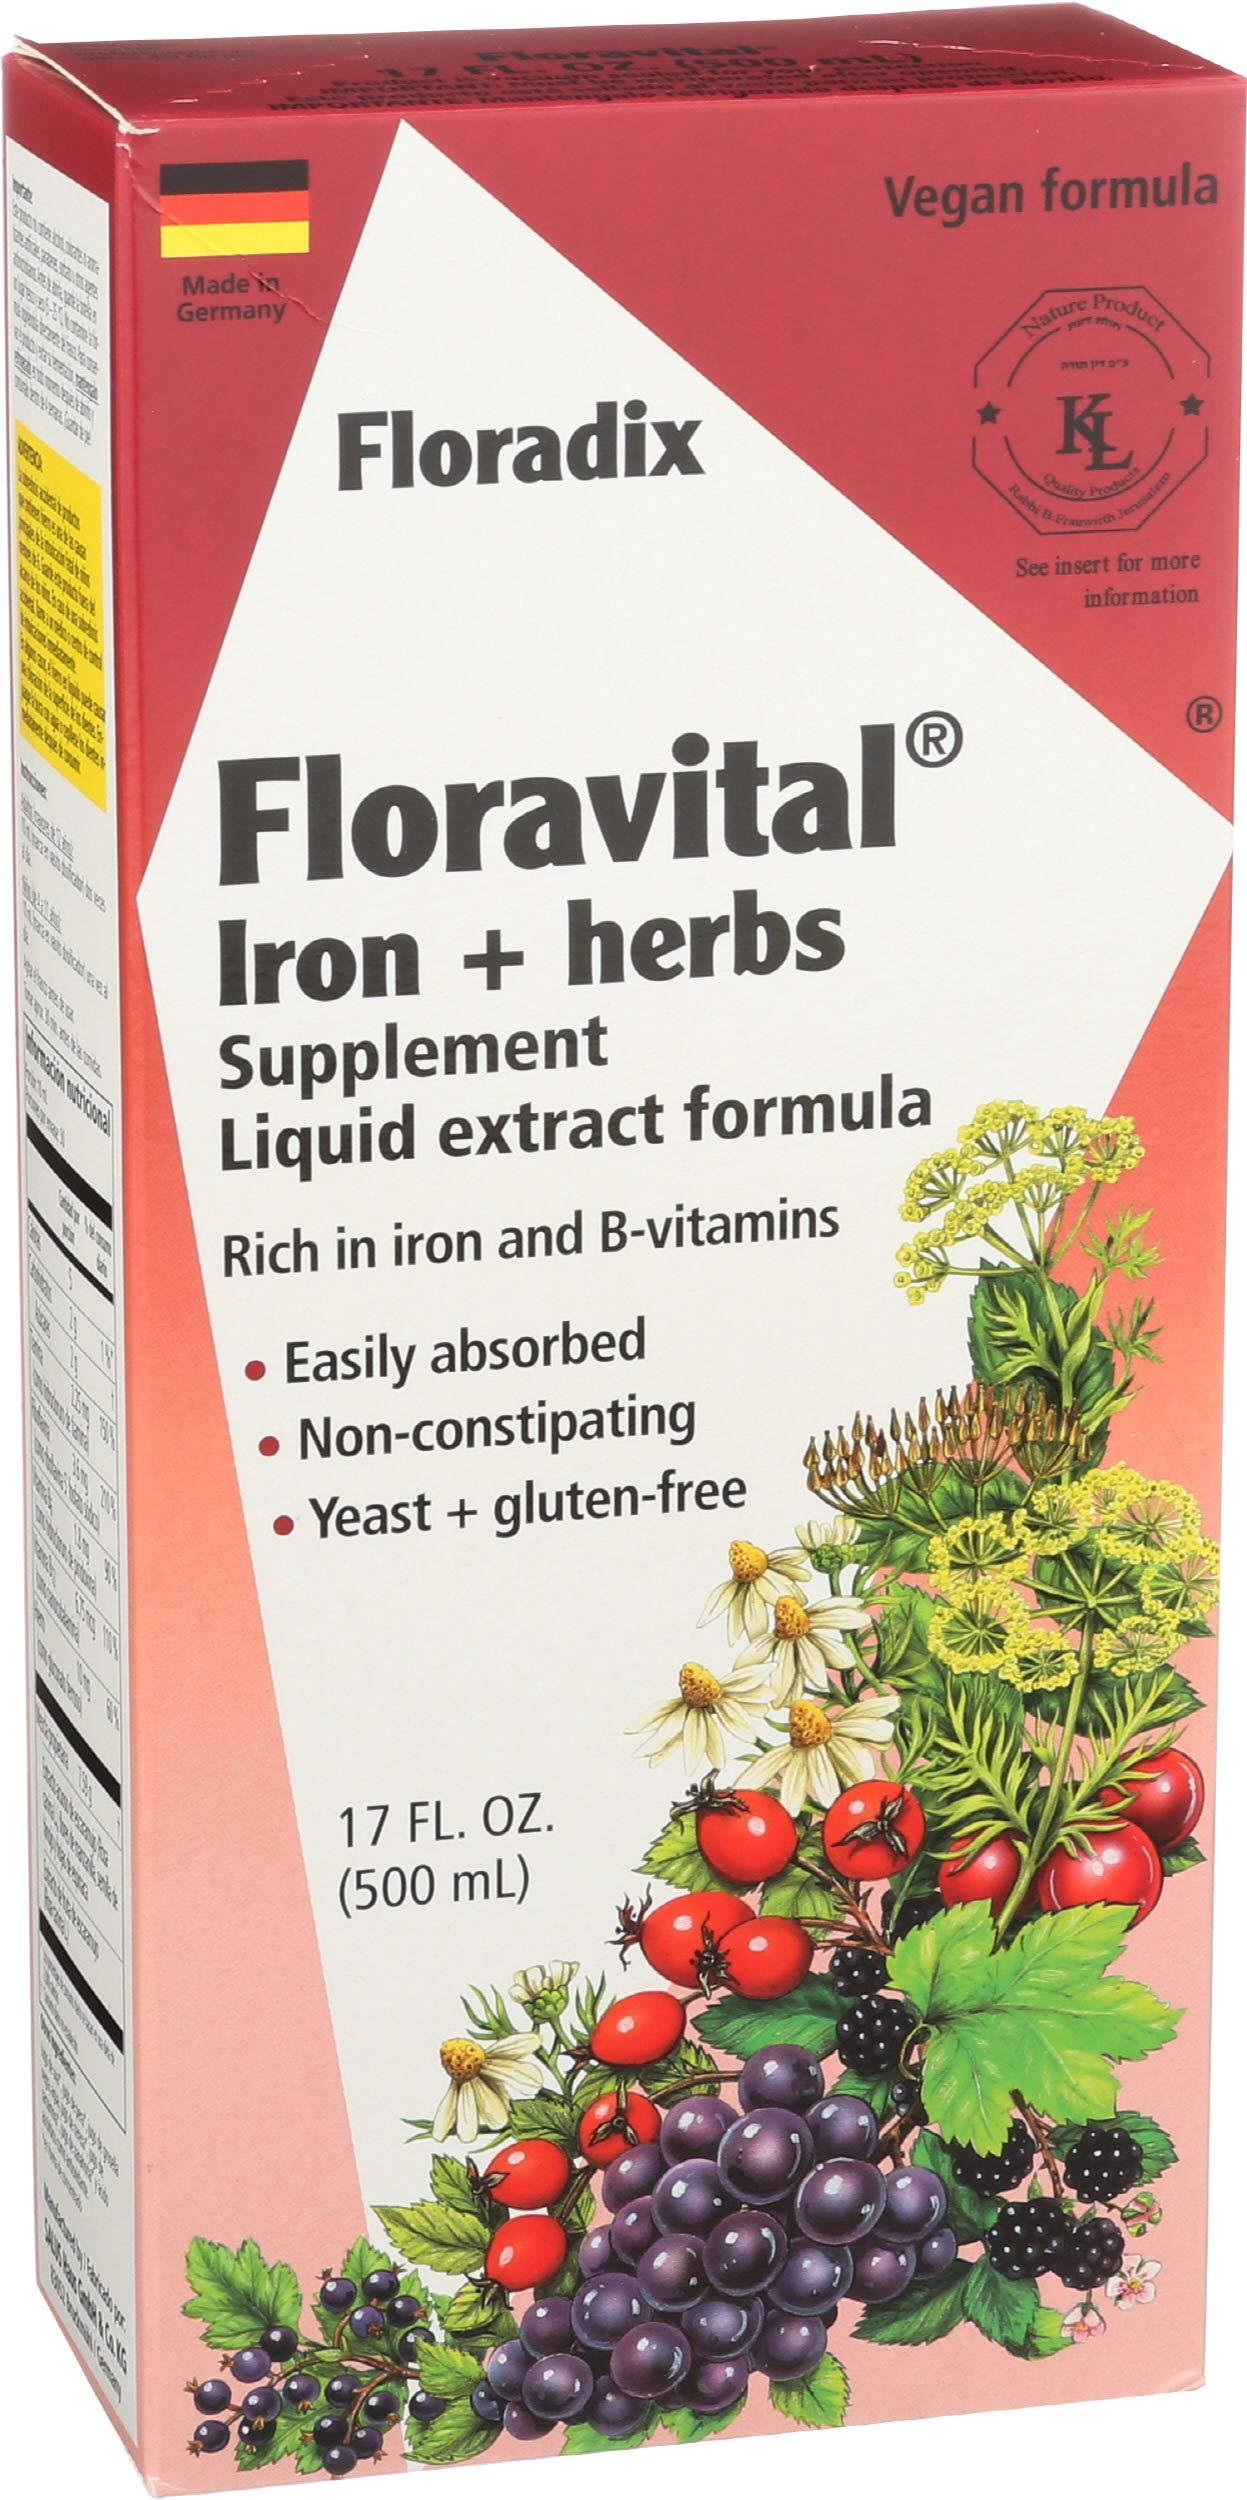 Floradix Floravital Liquid Iron And Vitamin Formula 500 Ml Buy Online In Faroe Islands At Faroe Desertcart Com Productid 47990643